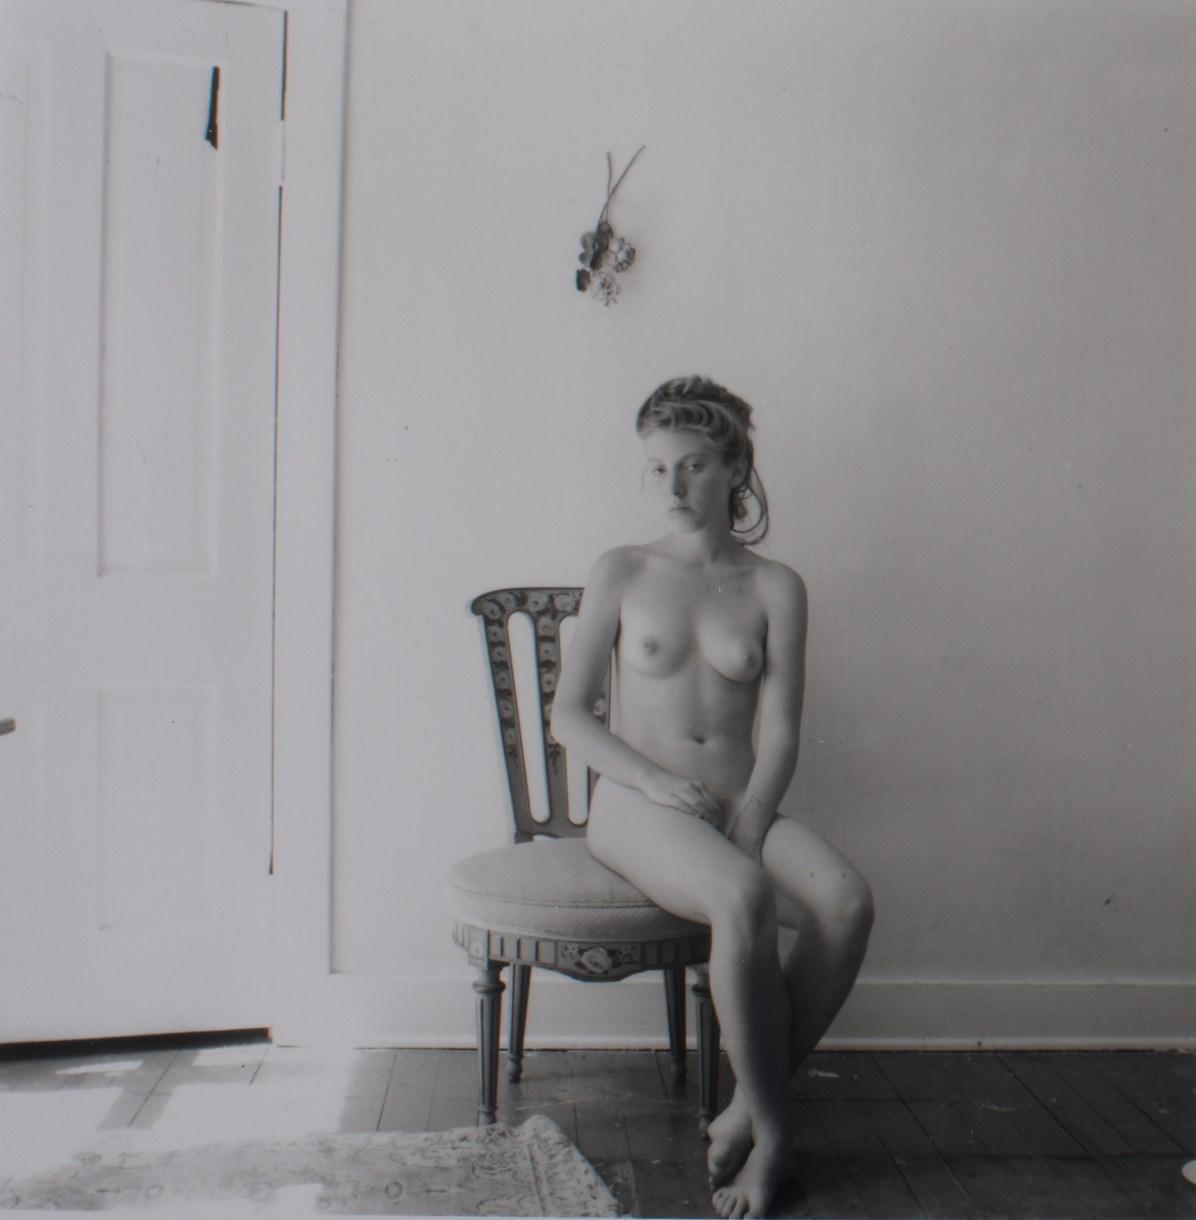 Francesca Woodman, Untitled, Providence, Rhode Island, 1978, printed 2008, gelatine silver estate